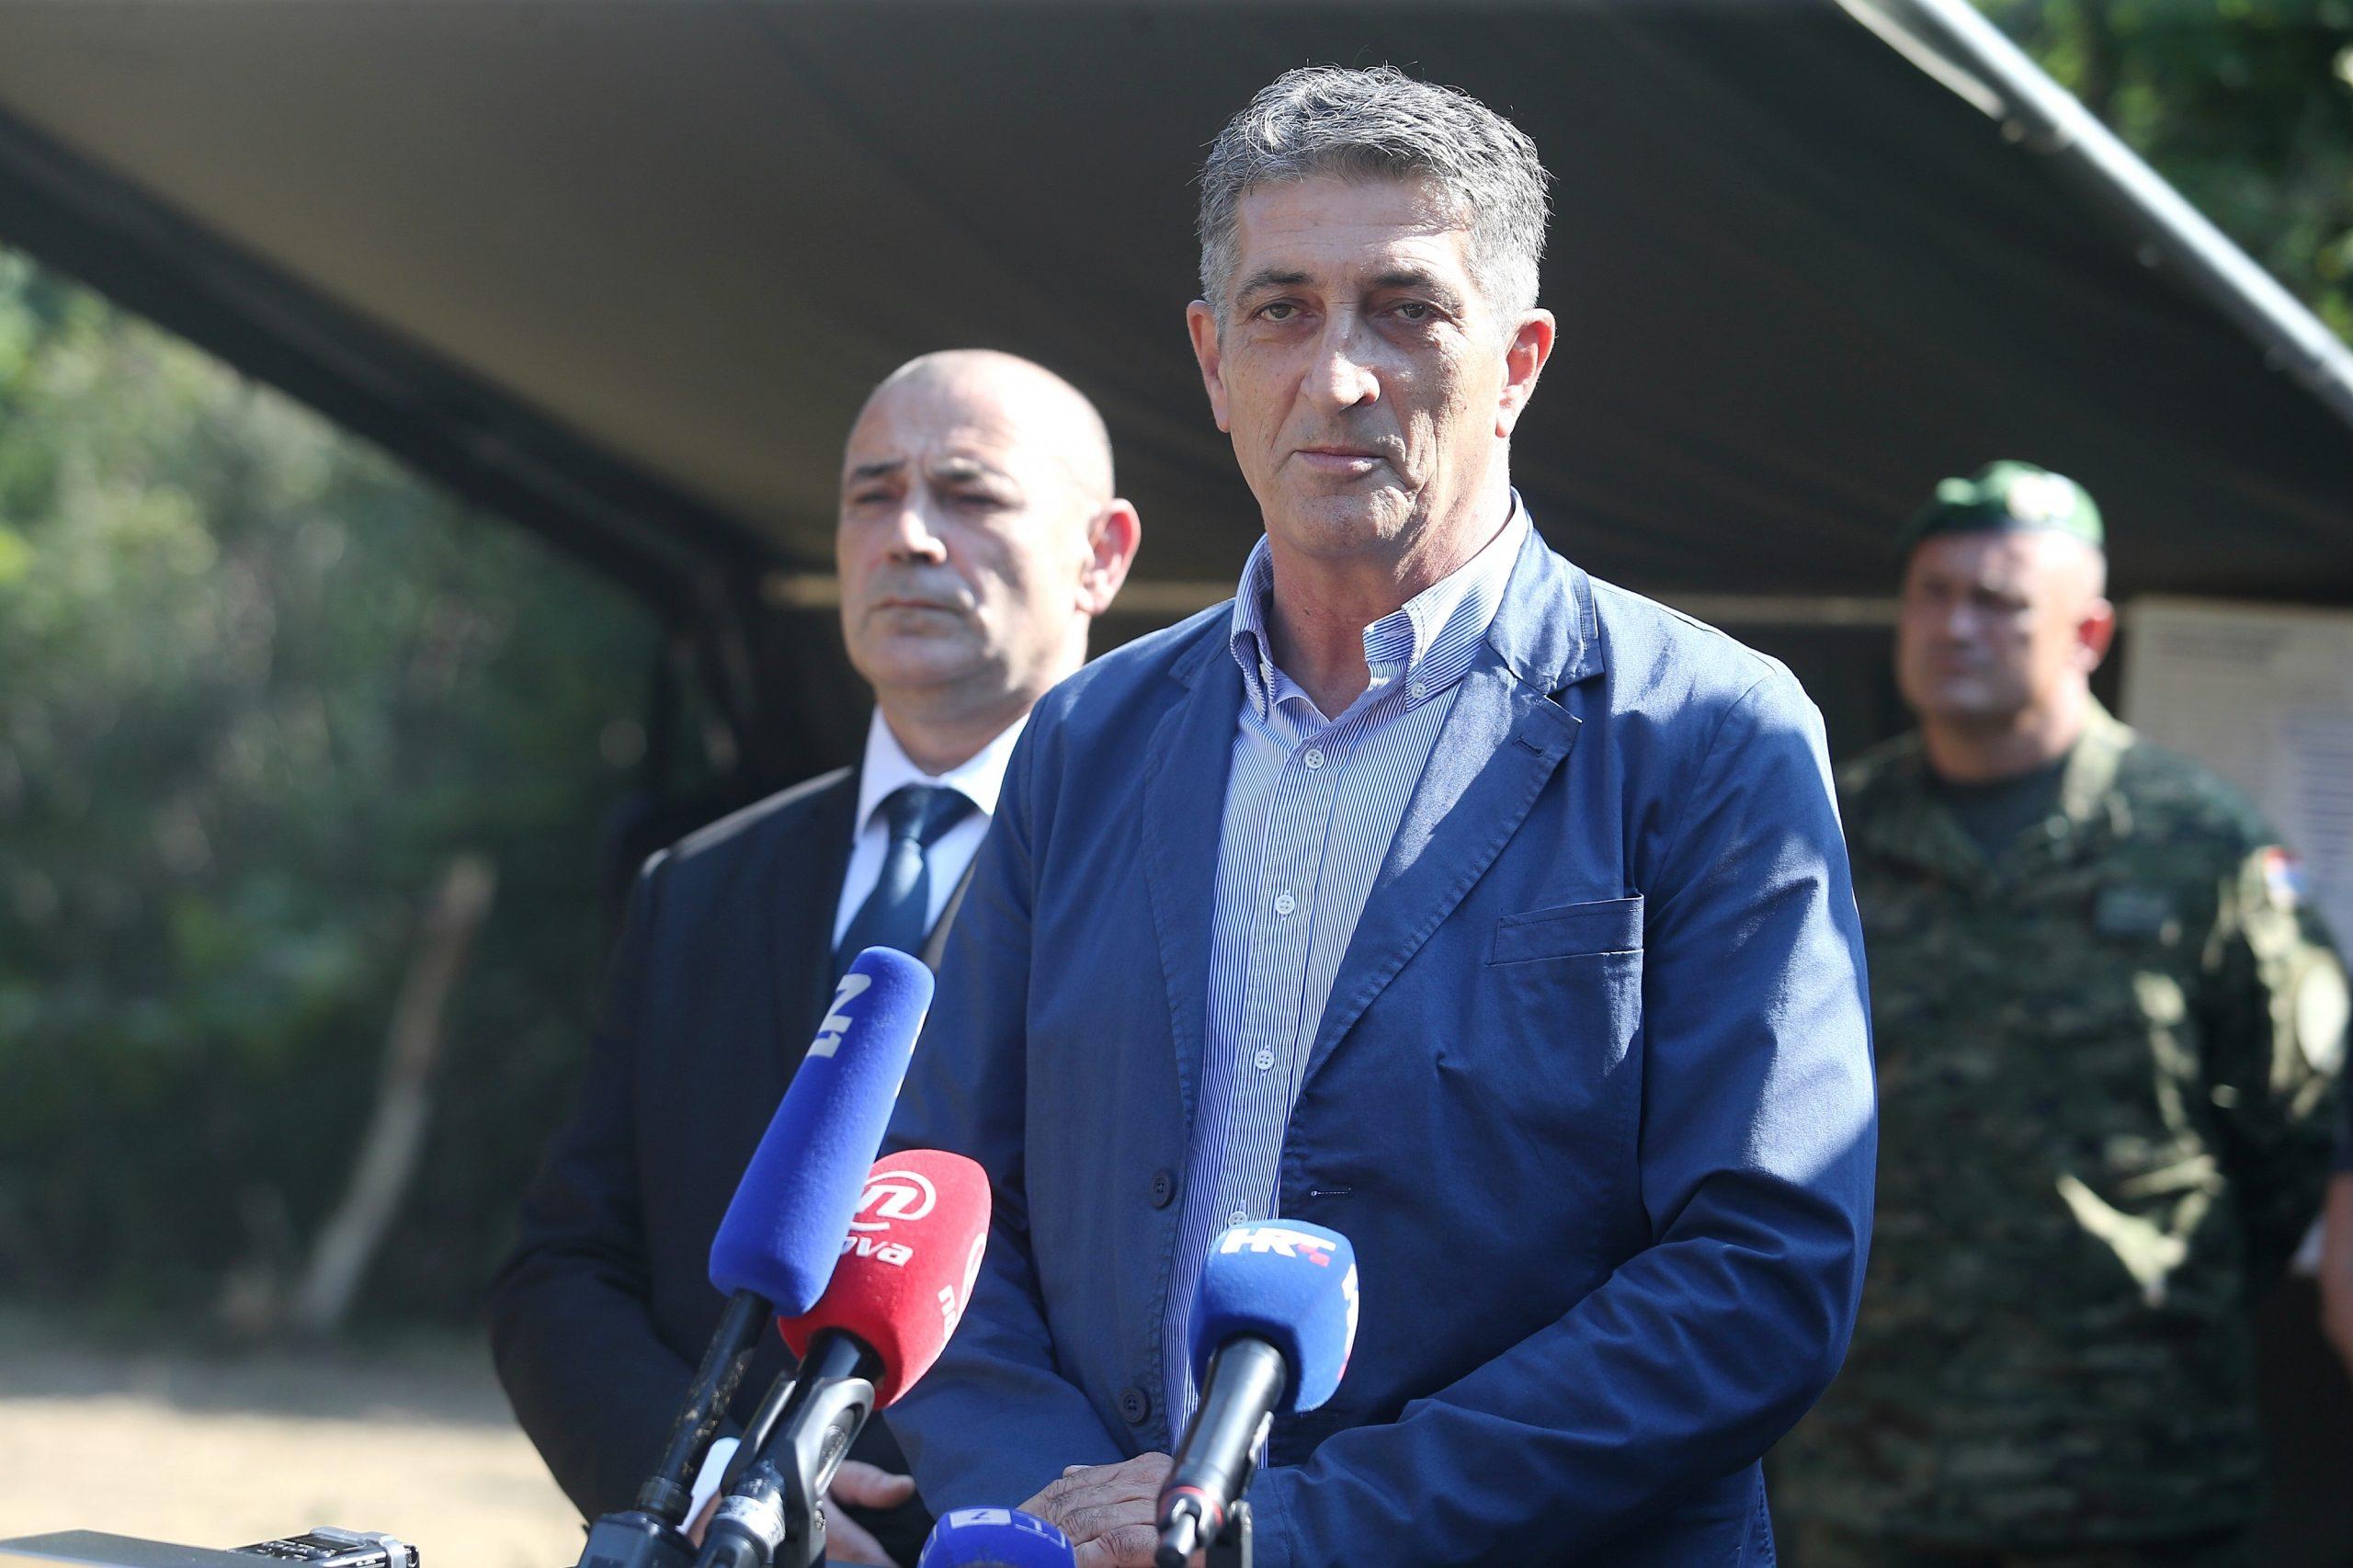 Državni tajnik Stjepan Sučić, foto: Dalibor Urukalovic/PIXSELL